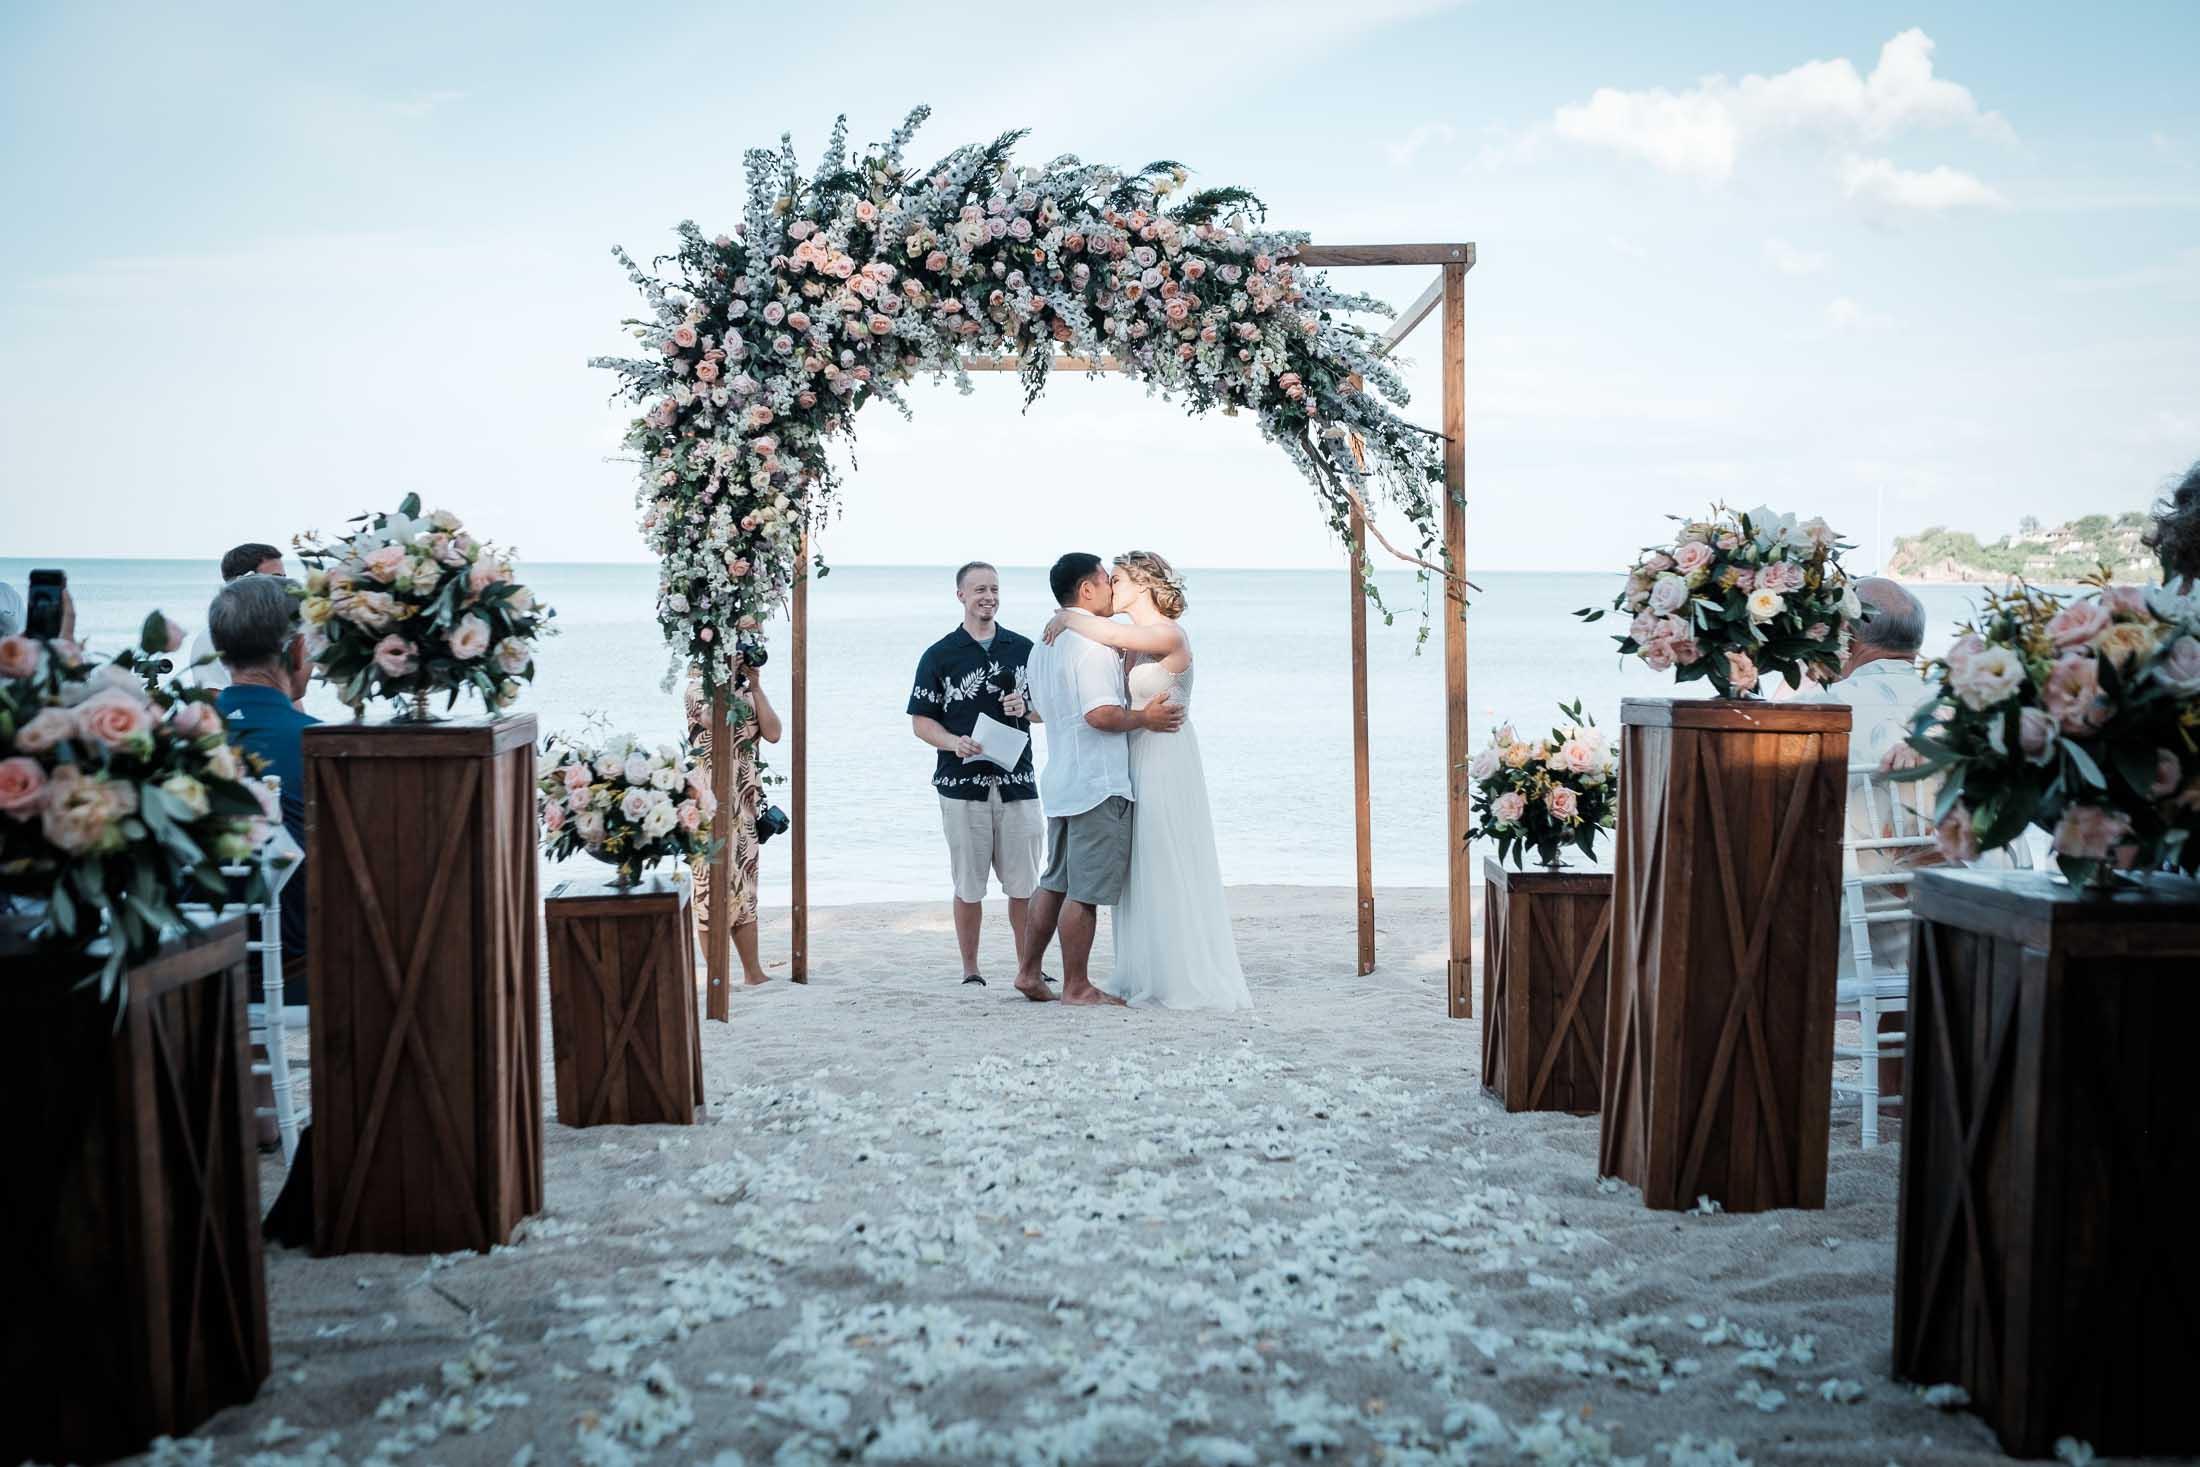 Photographe Mariage Thailande cérémonie plage